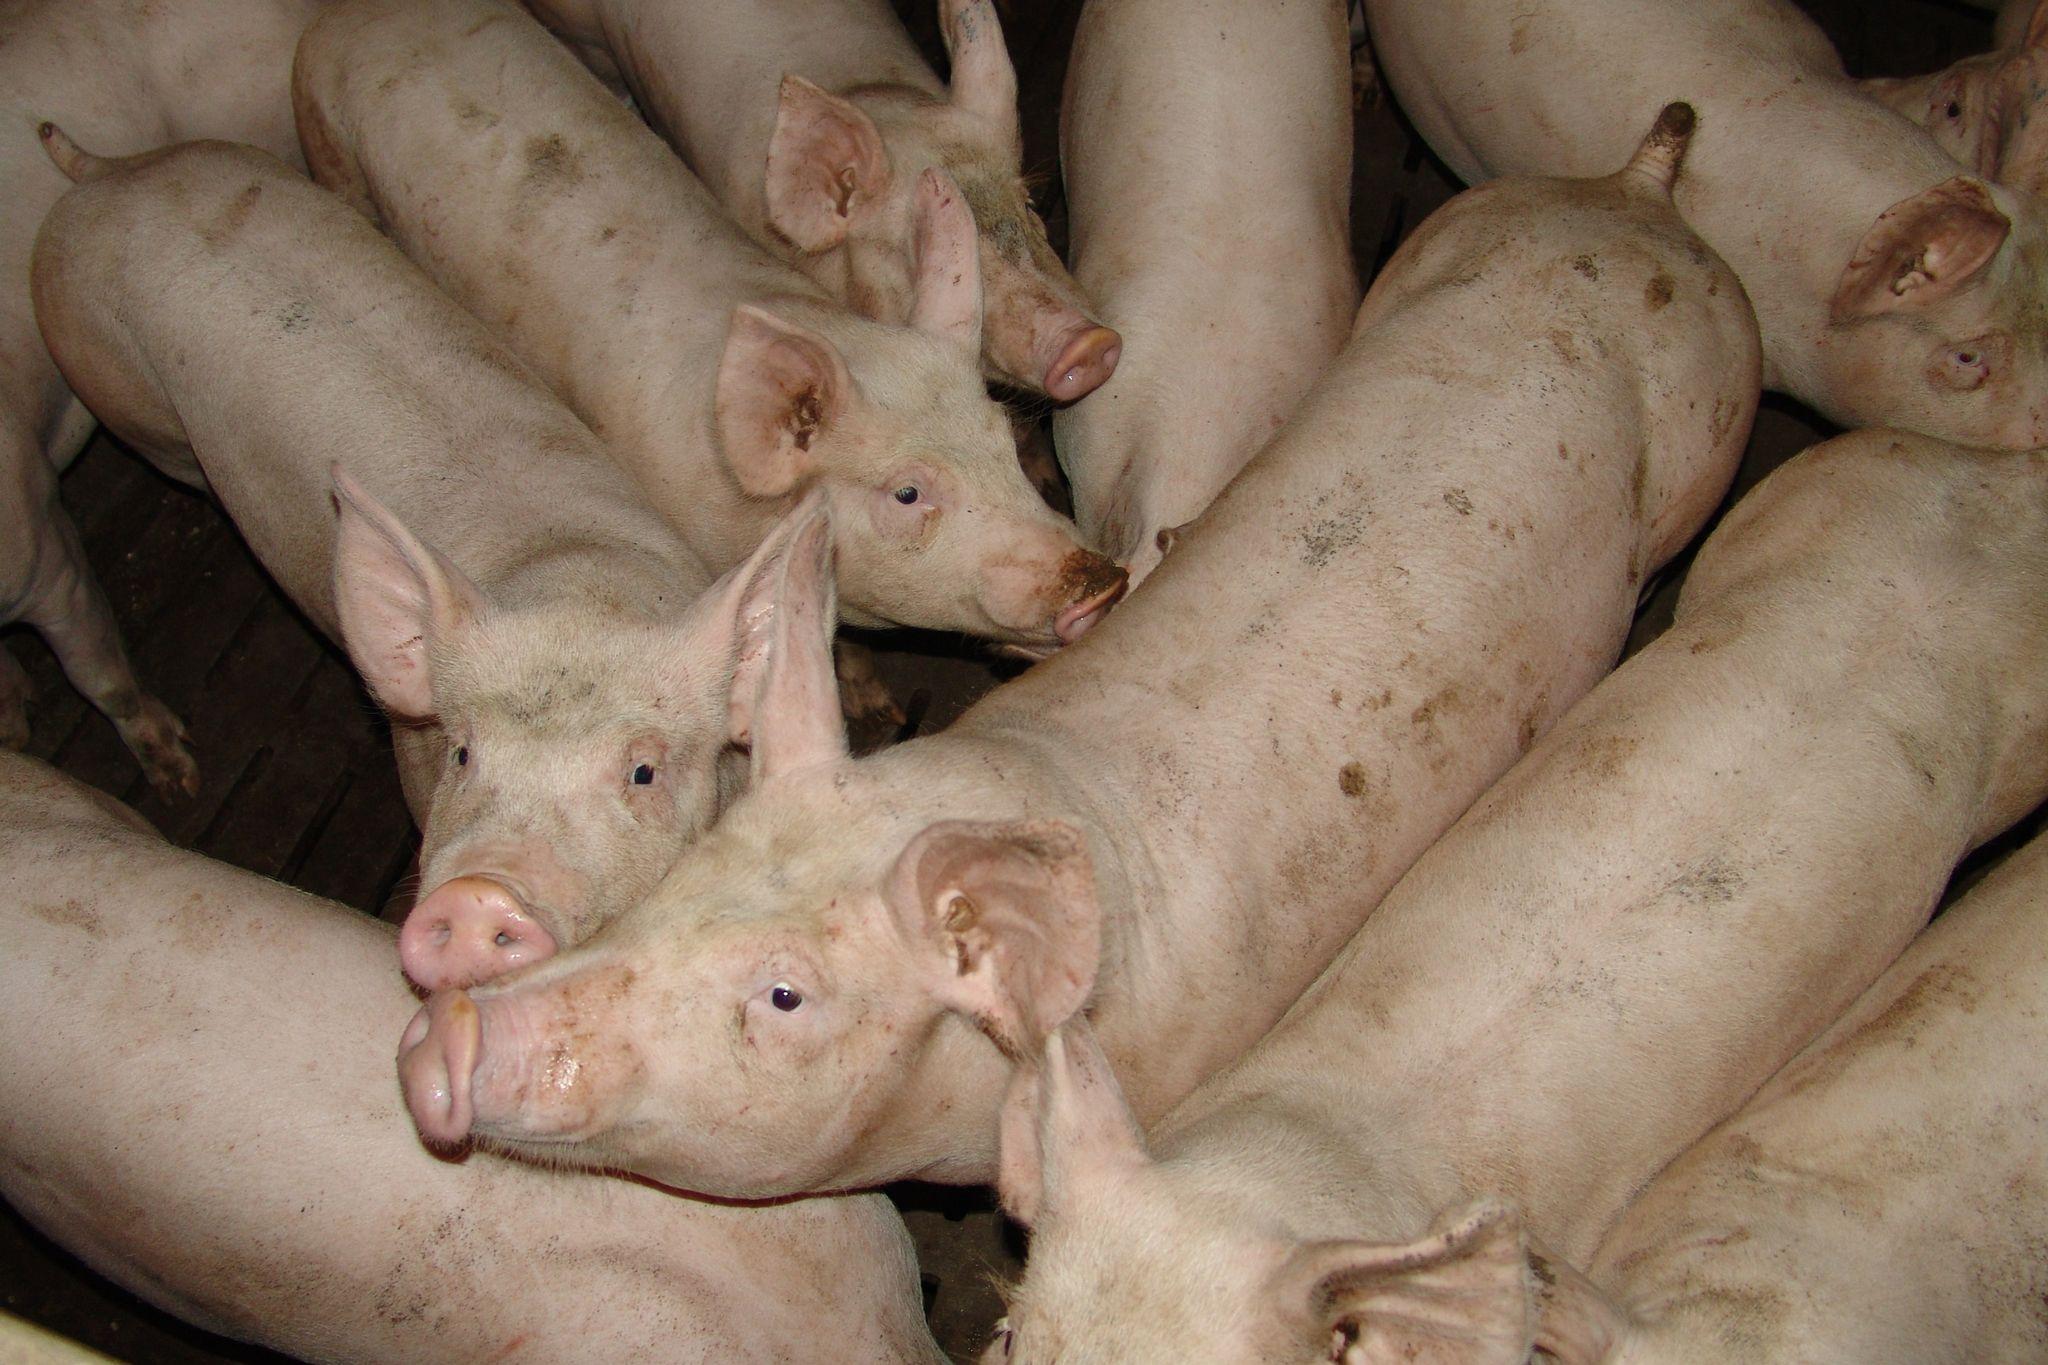 Vietnam's Pig Farmers Hit as Consumers Shun Pork Due to Swine Fever